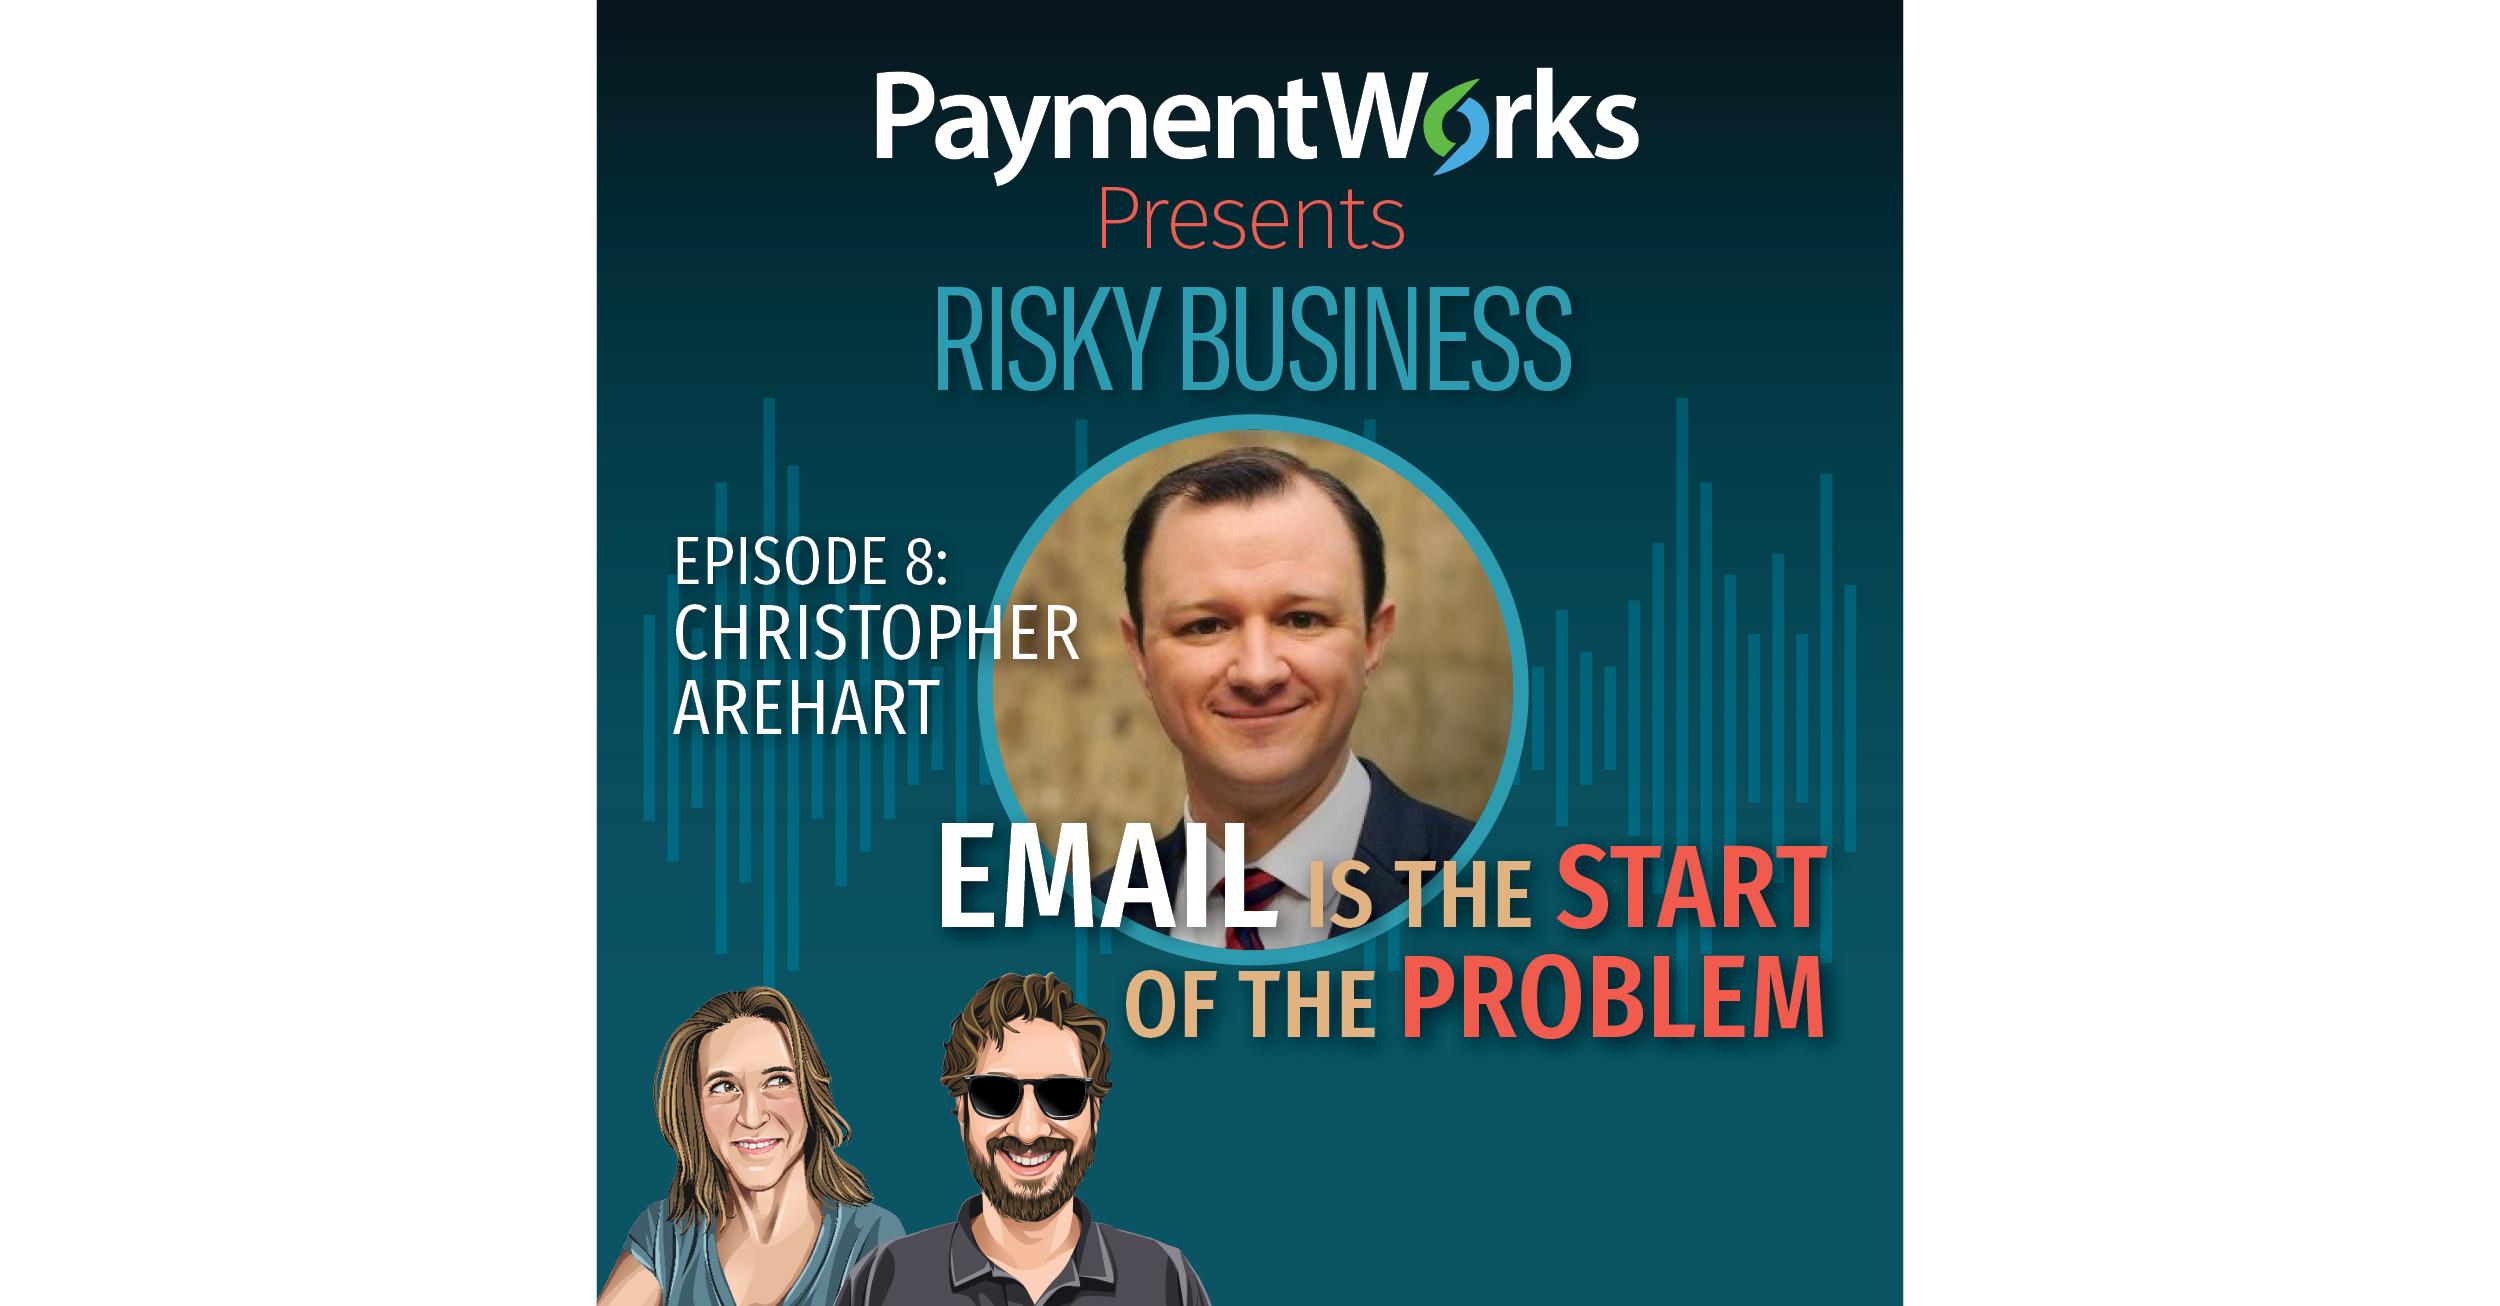 PaymentWorks Presents-Episode8-Christopher Arehart-LinkedIn